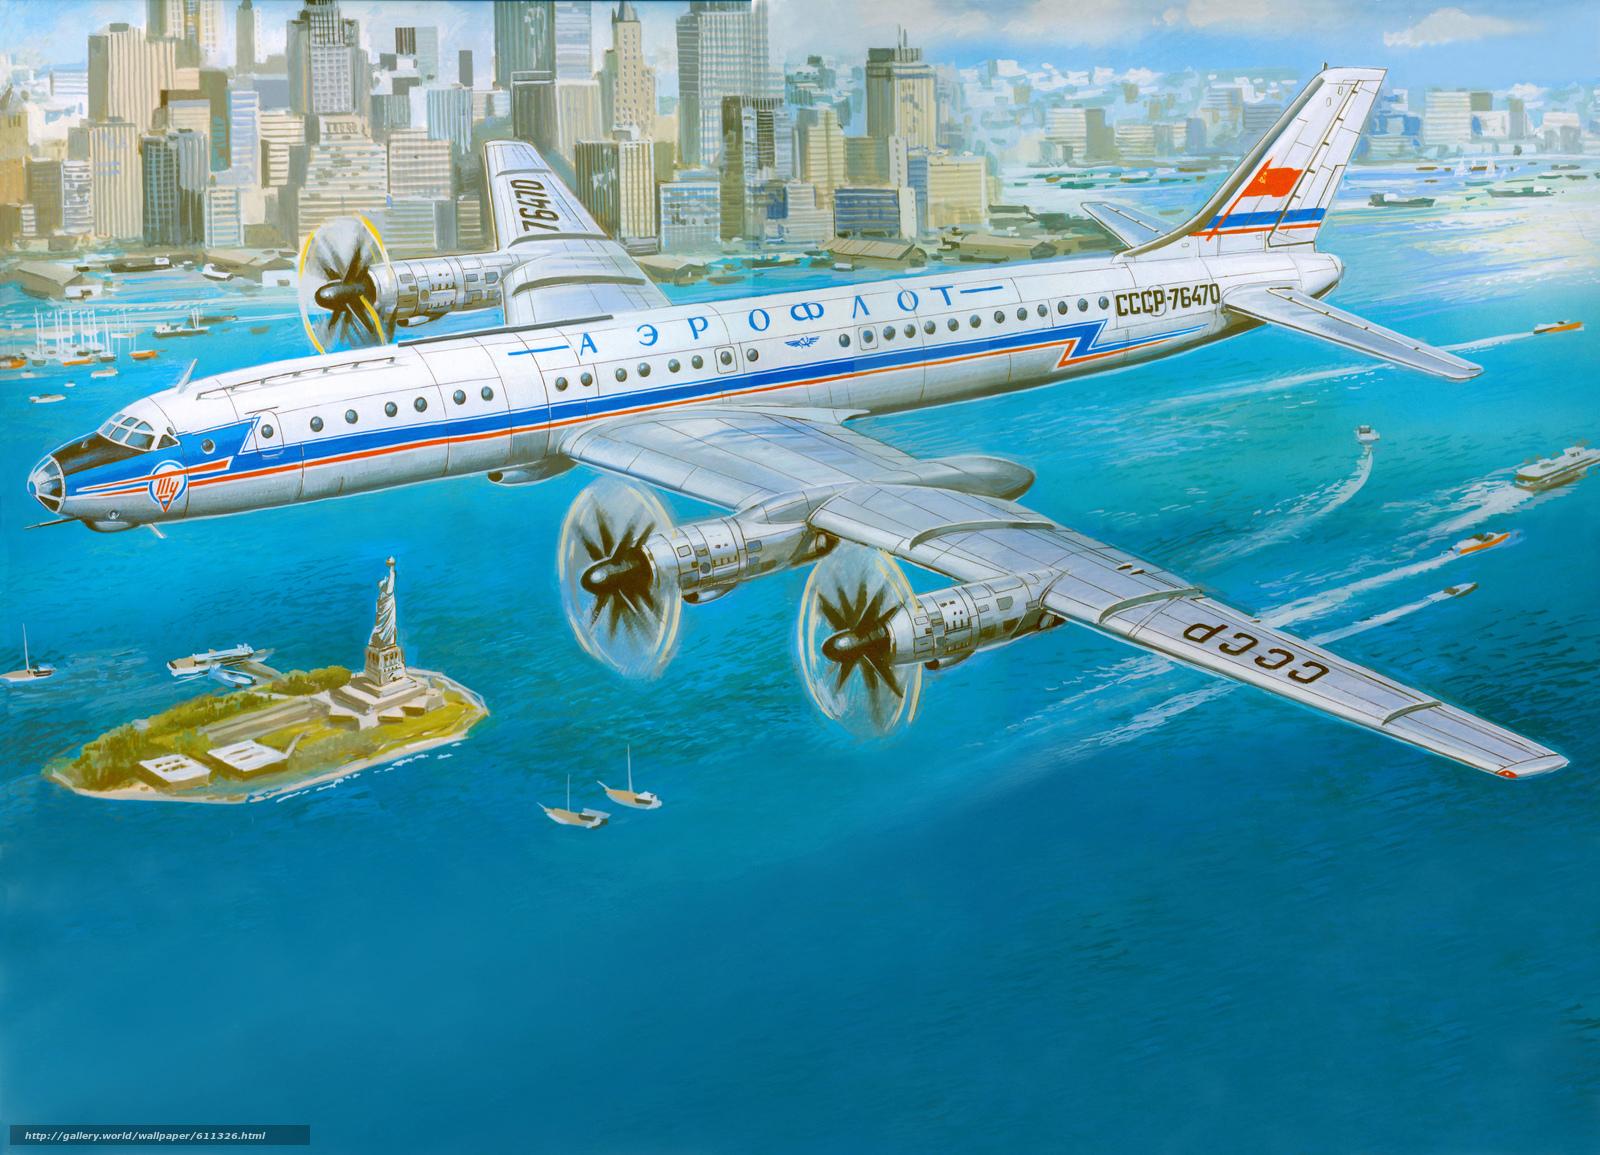 Download wallpaper Tu-114,  Soviet,  turboprop,  Passenger free desktop wallpaper in the resolution 9906x7151 — picture №611326